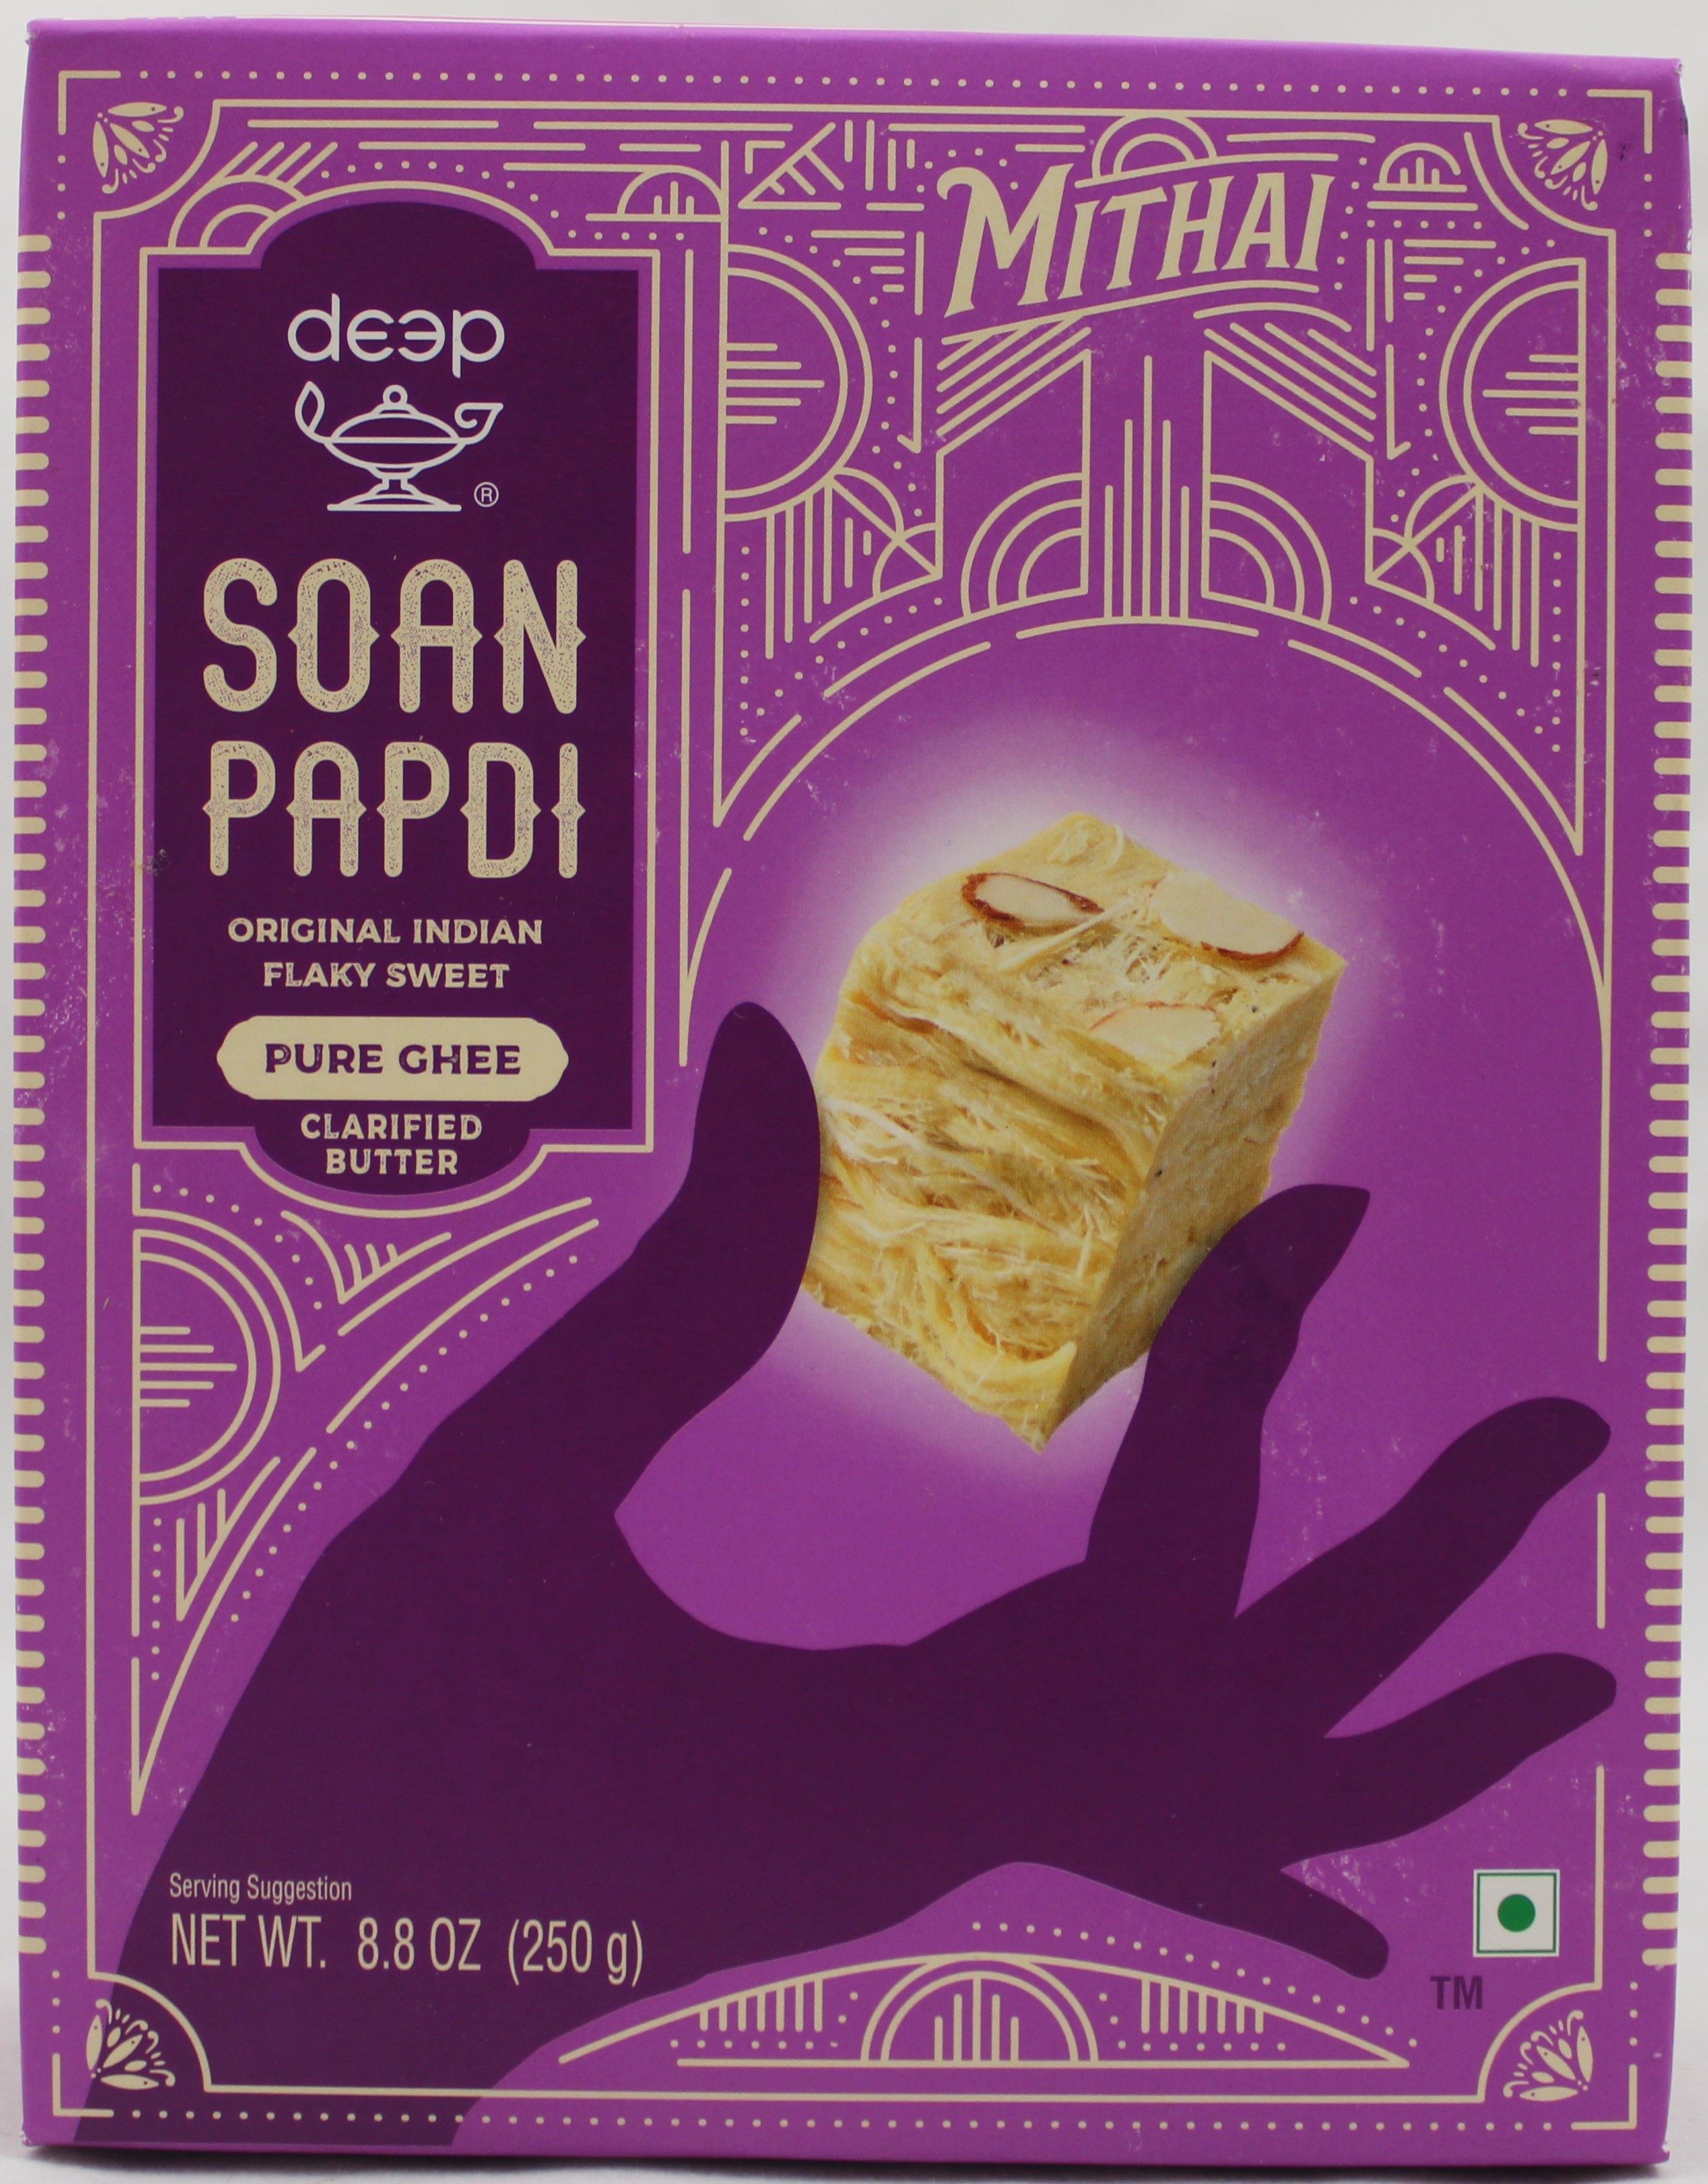 Soan Papdi - Pure Ghee 8.8 Oz